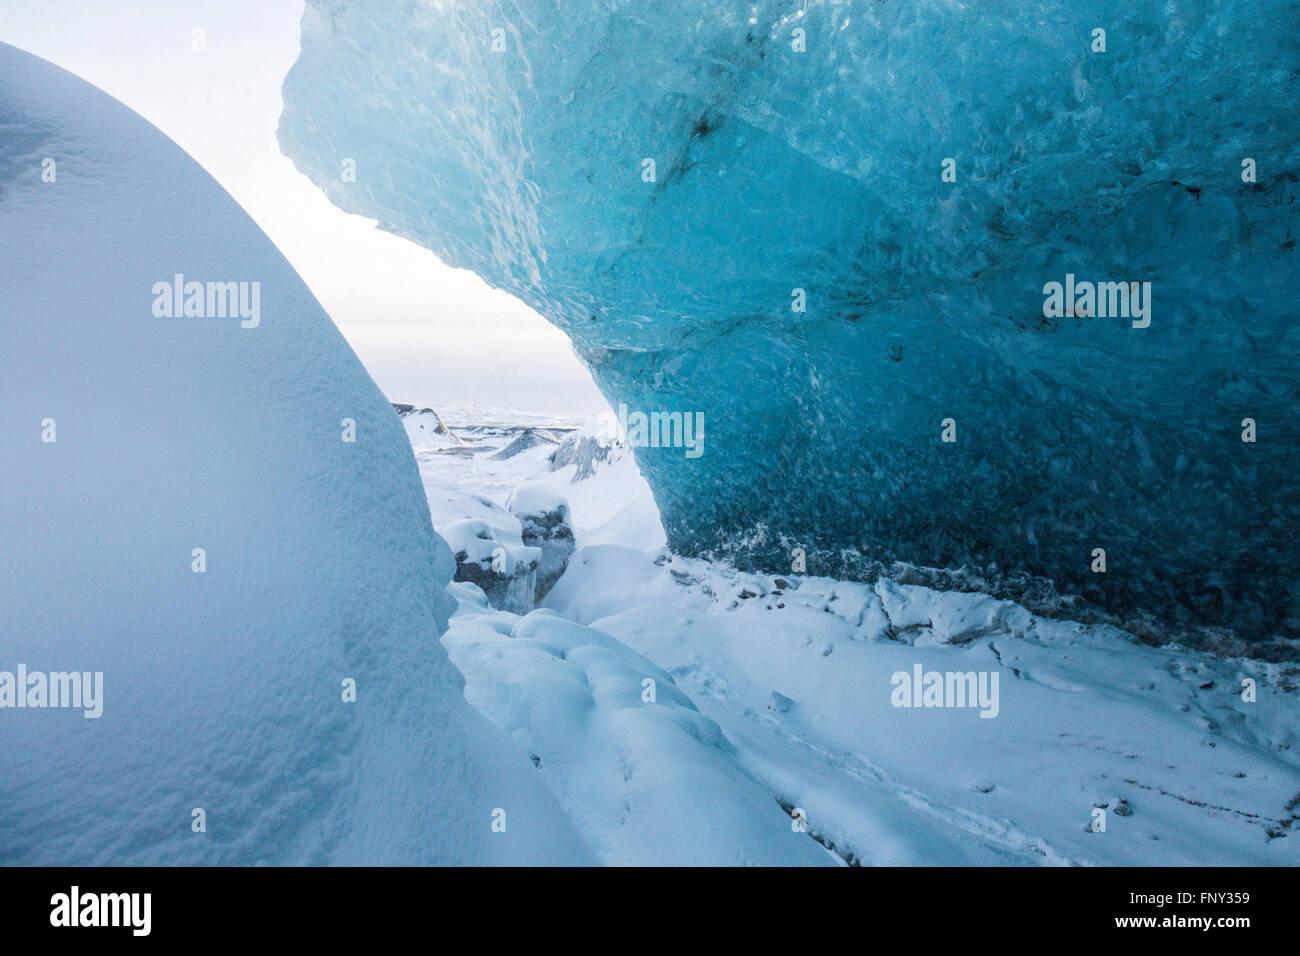 Ice cave, Entrance, Vatnajökull Nationalpark, Glacier, Iceland - Stock Image